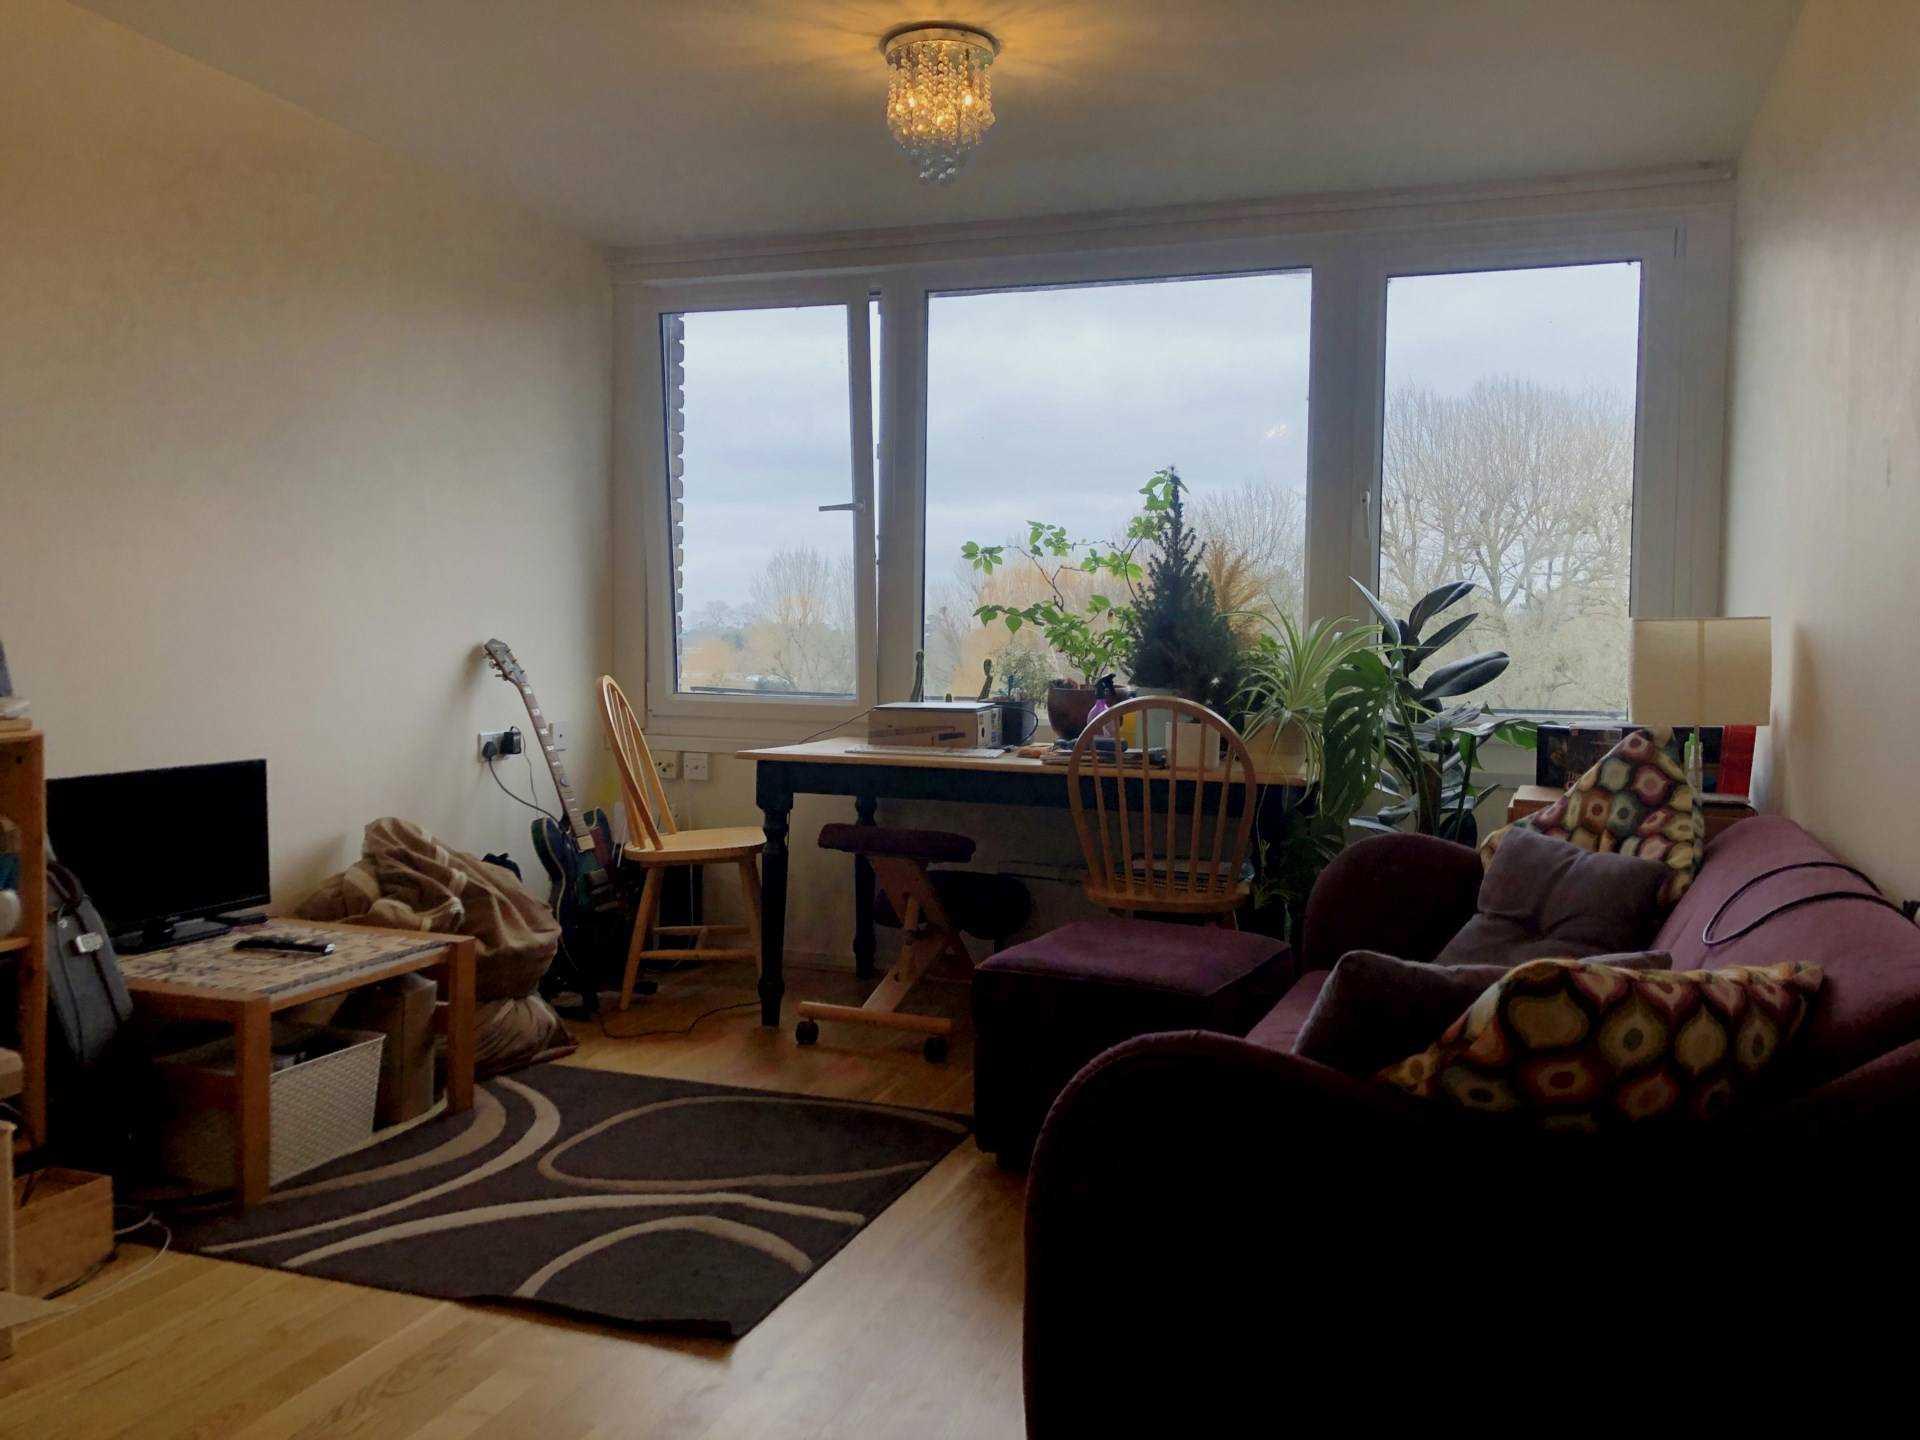 Xavi & Co - 1 Bedroom Flat, Otho Court, Brentford